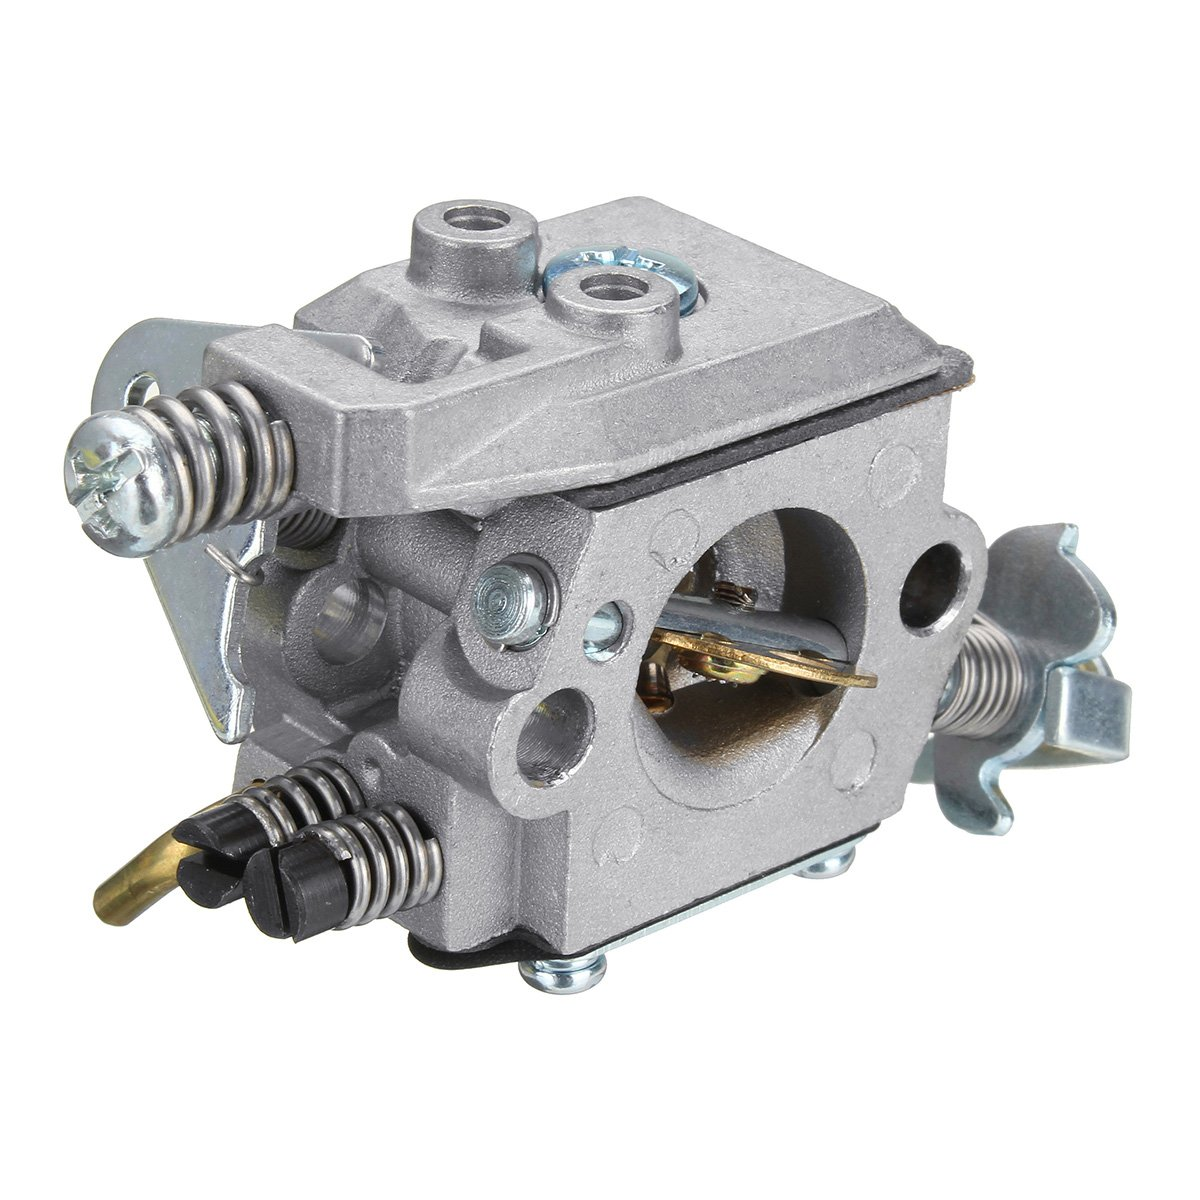 KUNSE Carburador De La Motosierra Carb 545081885 para Poulan 1950 ...